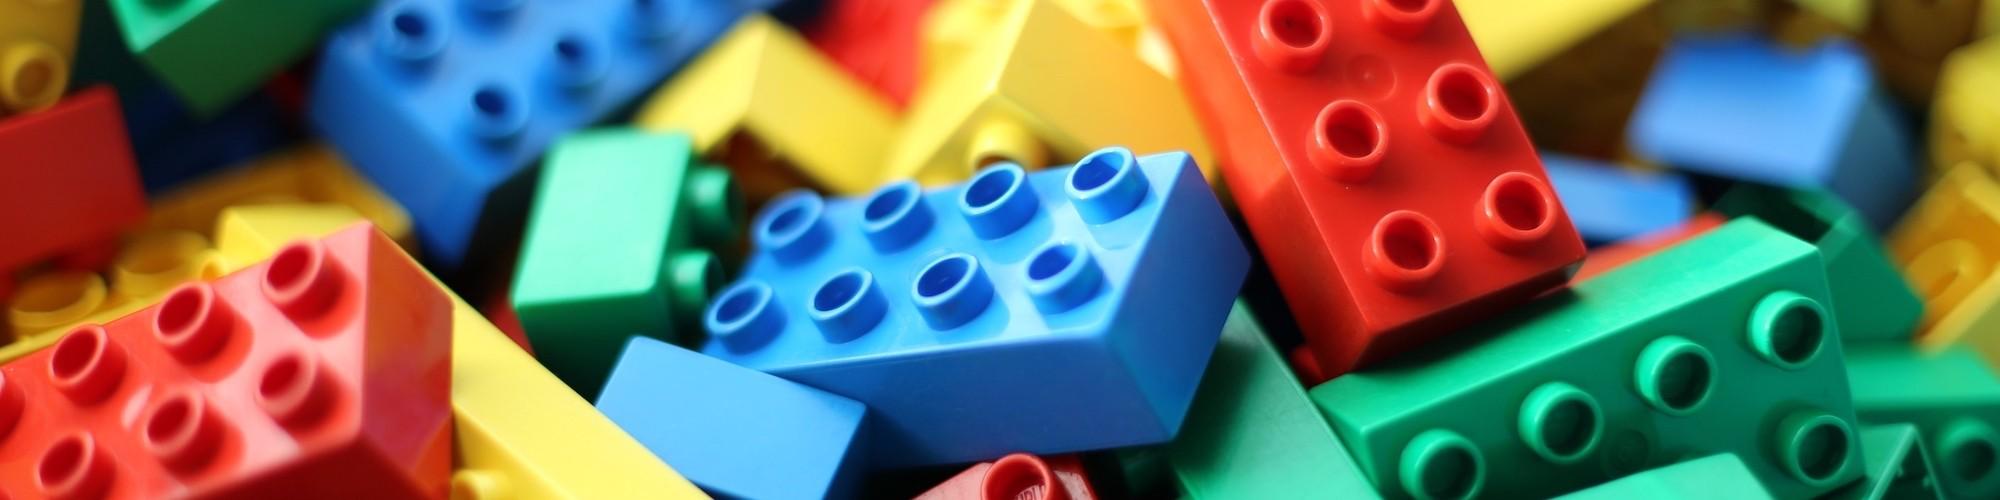 Legos - building blocks